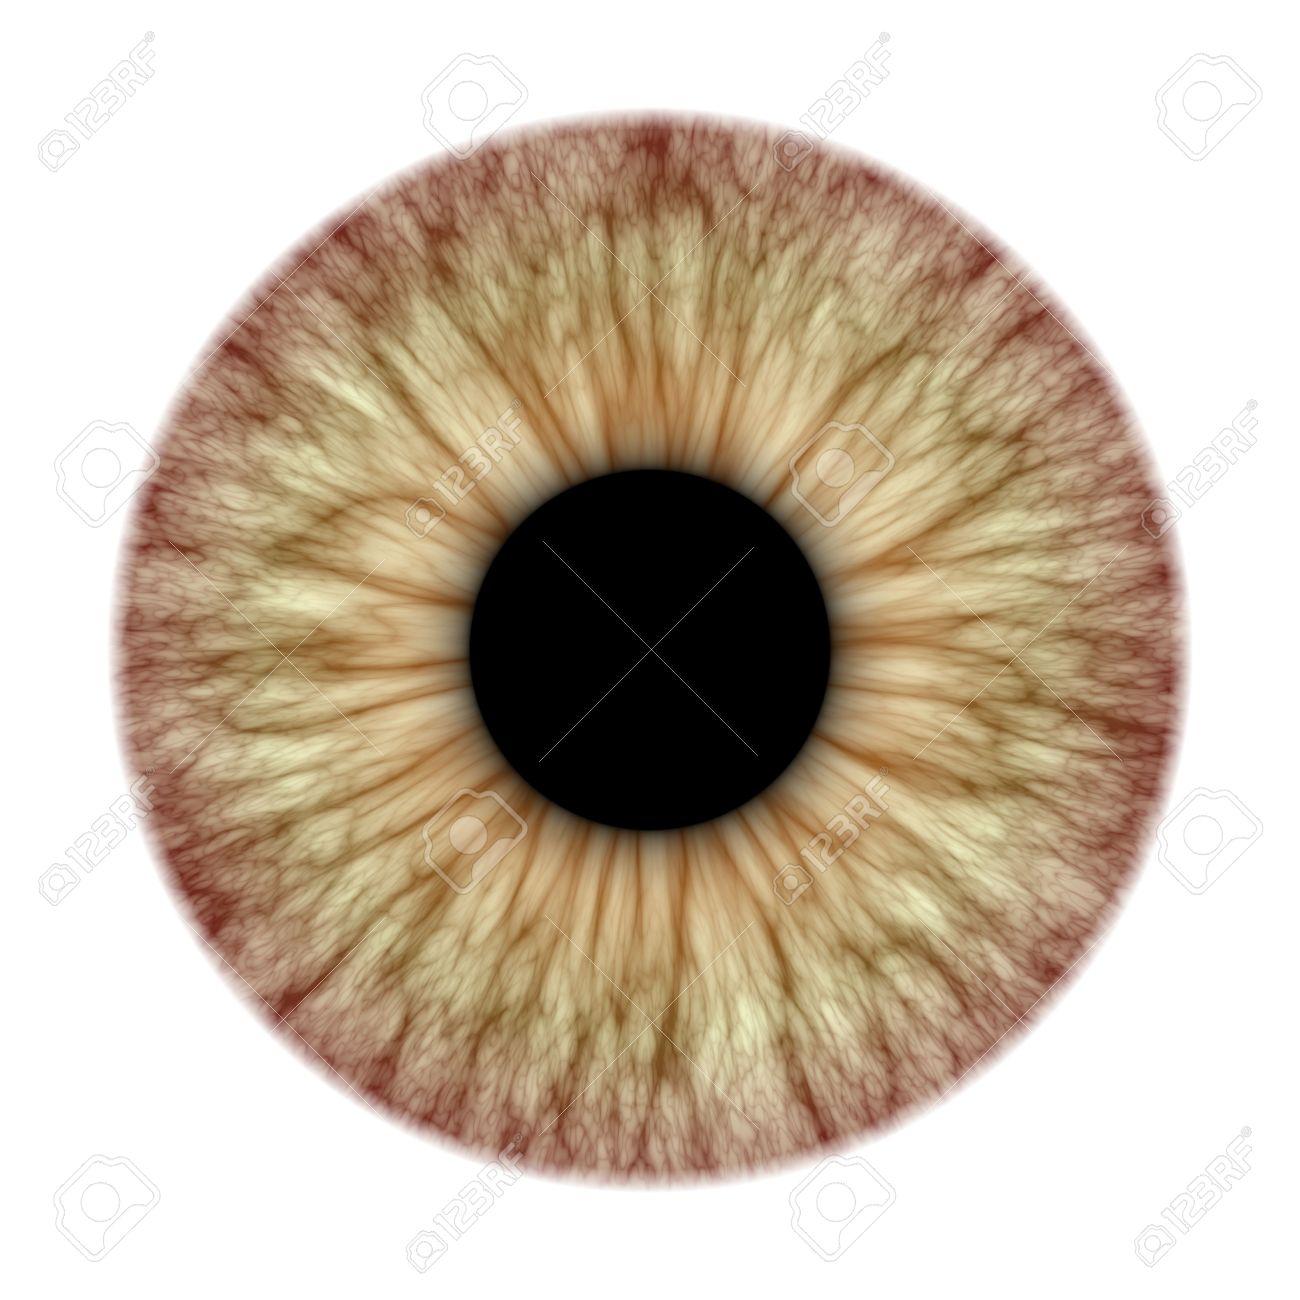 Iris eye diagram more information djekova anatomy iris an illustration iris eye diagram pooptronica Choice Image